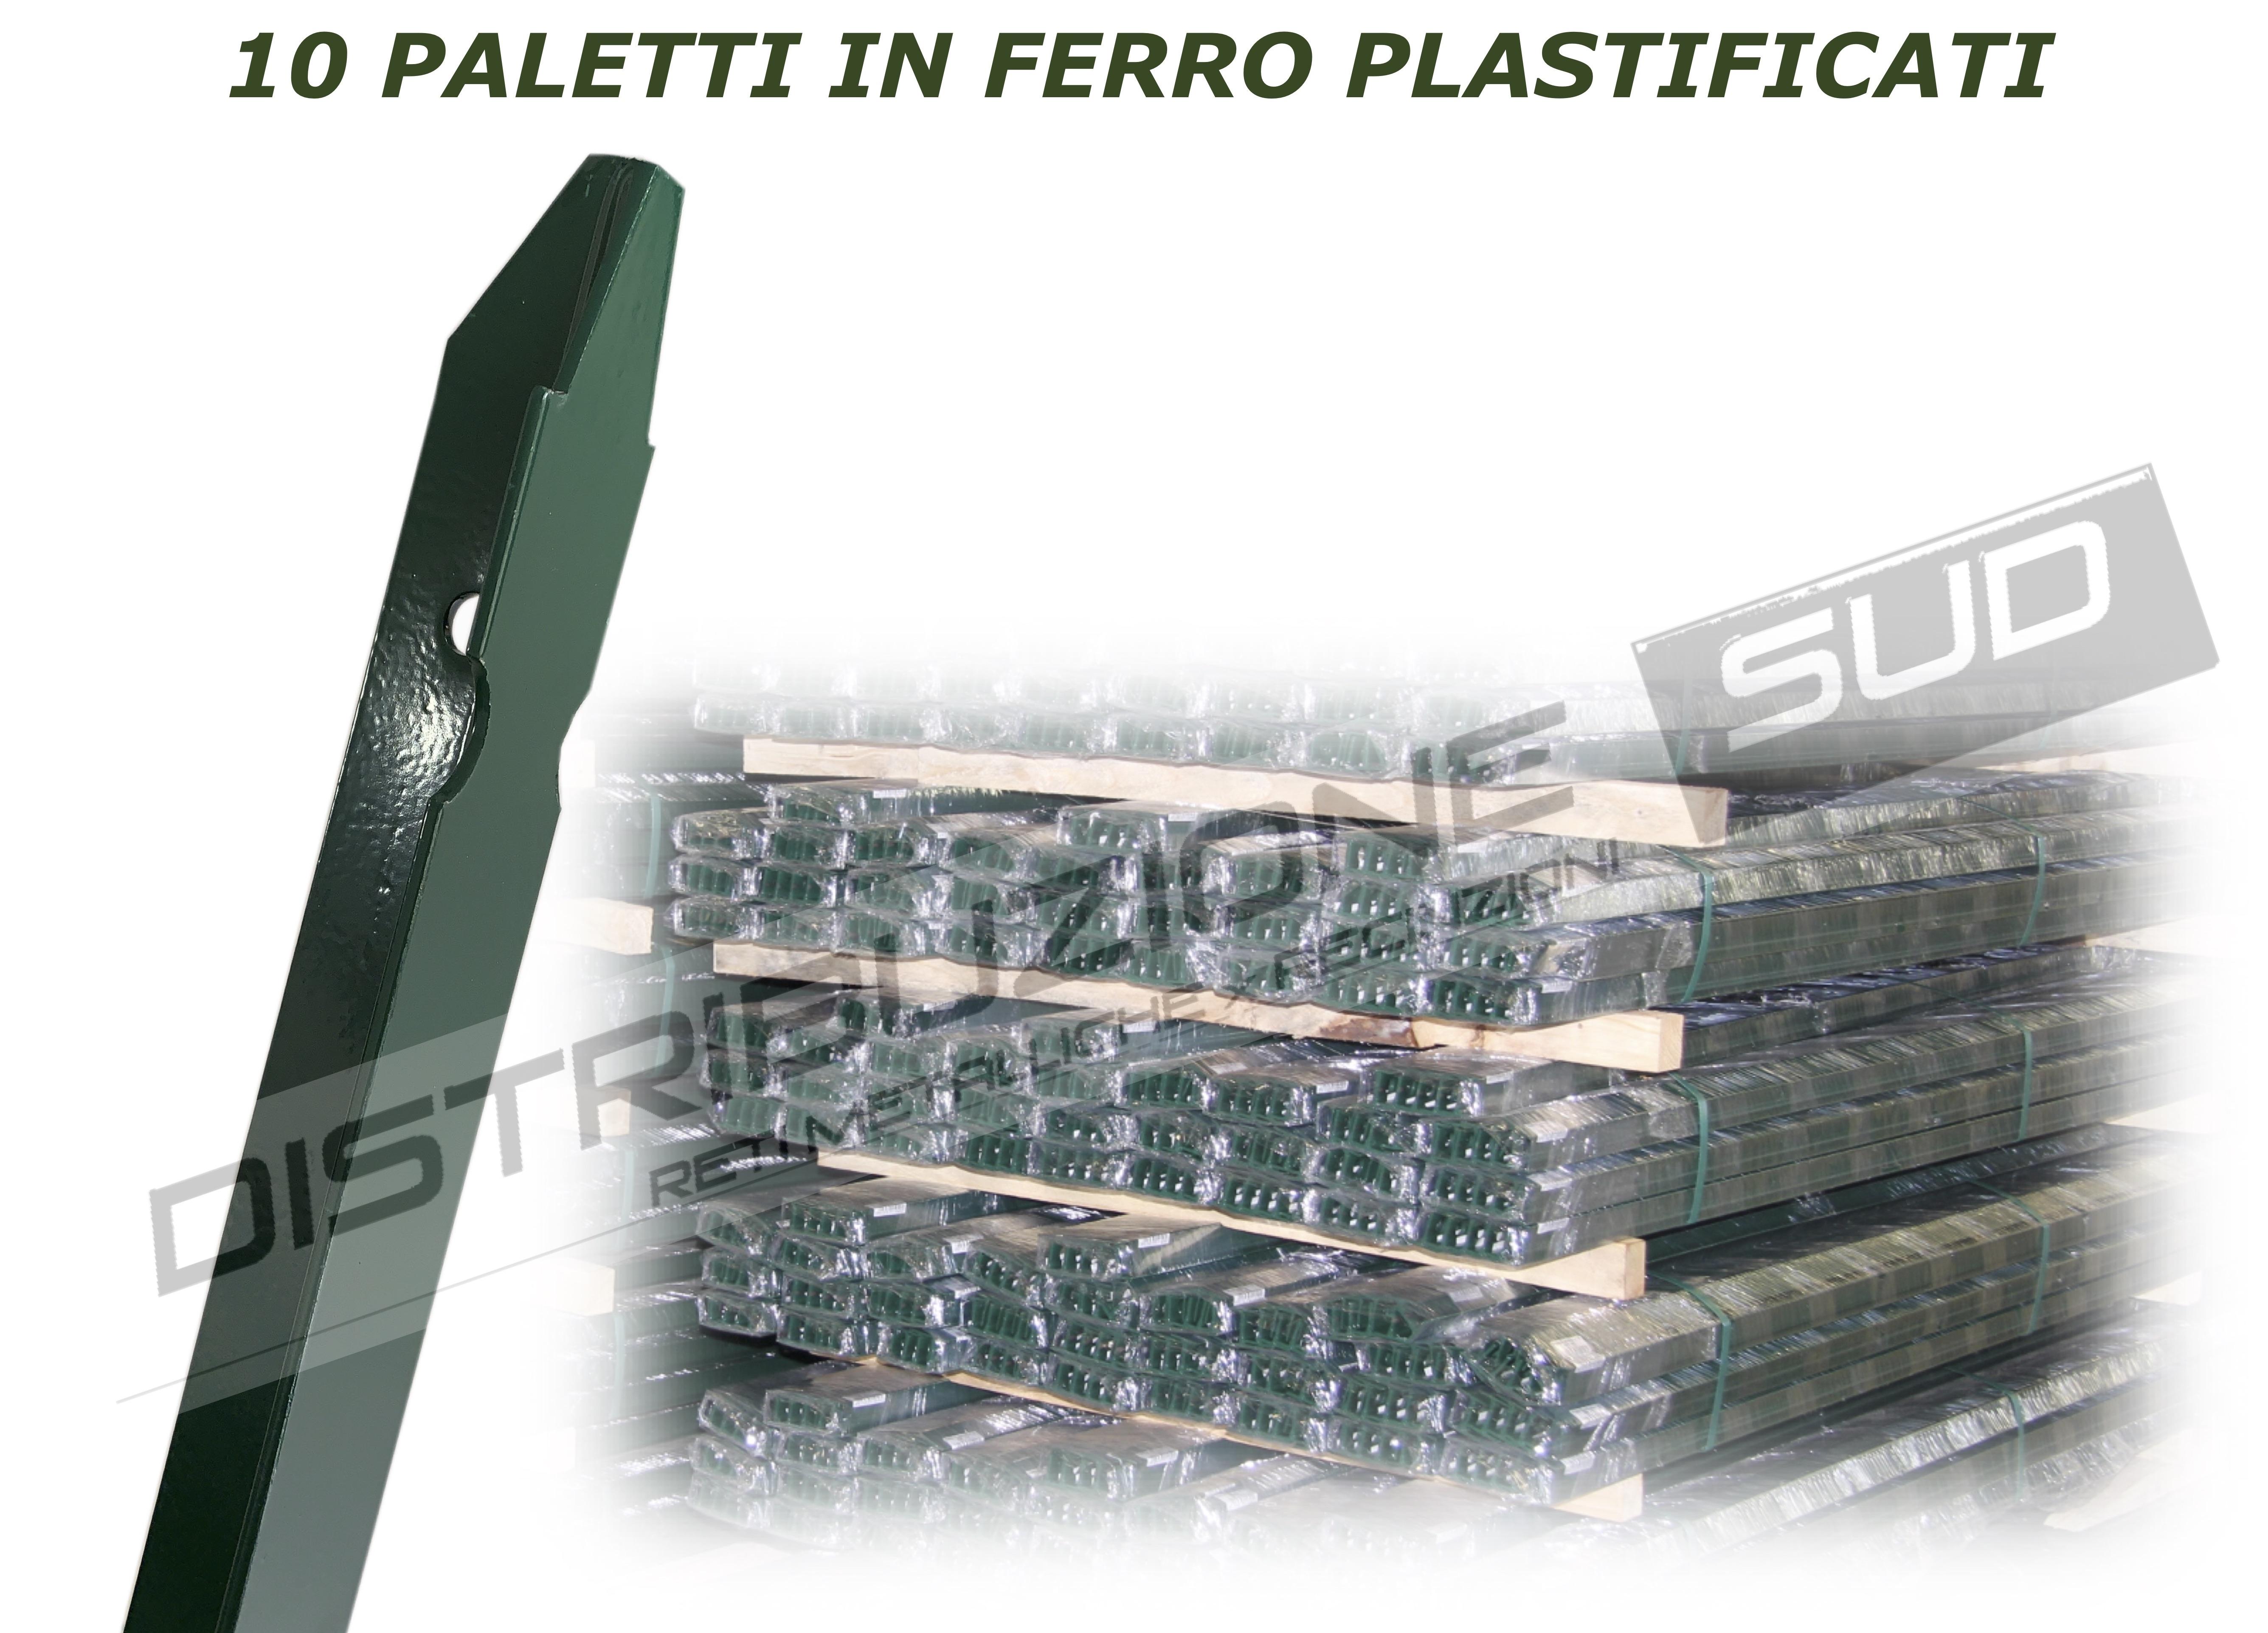 pali plastificati verdi